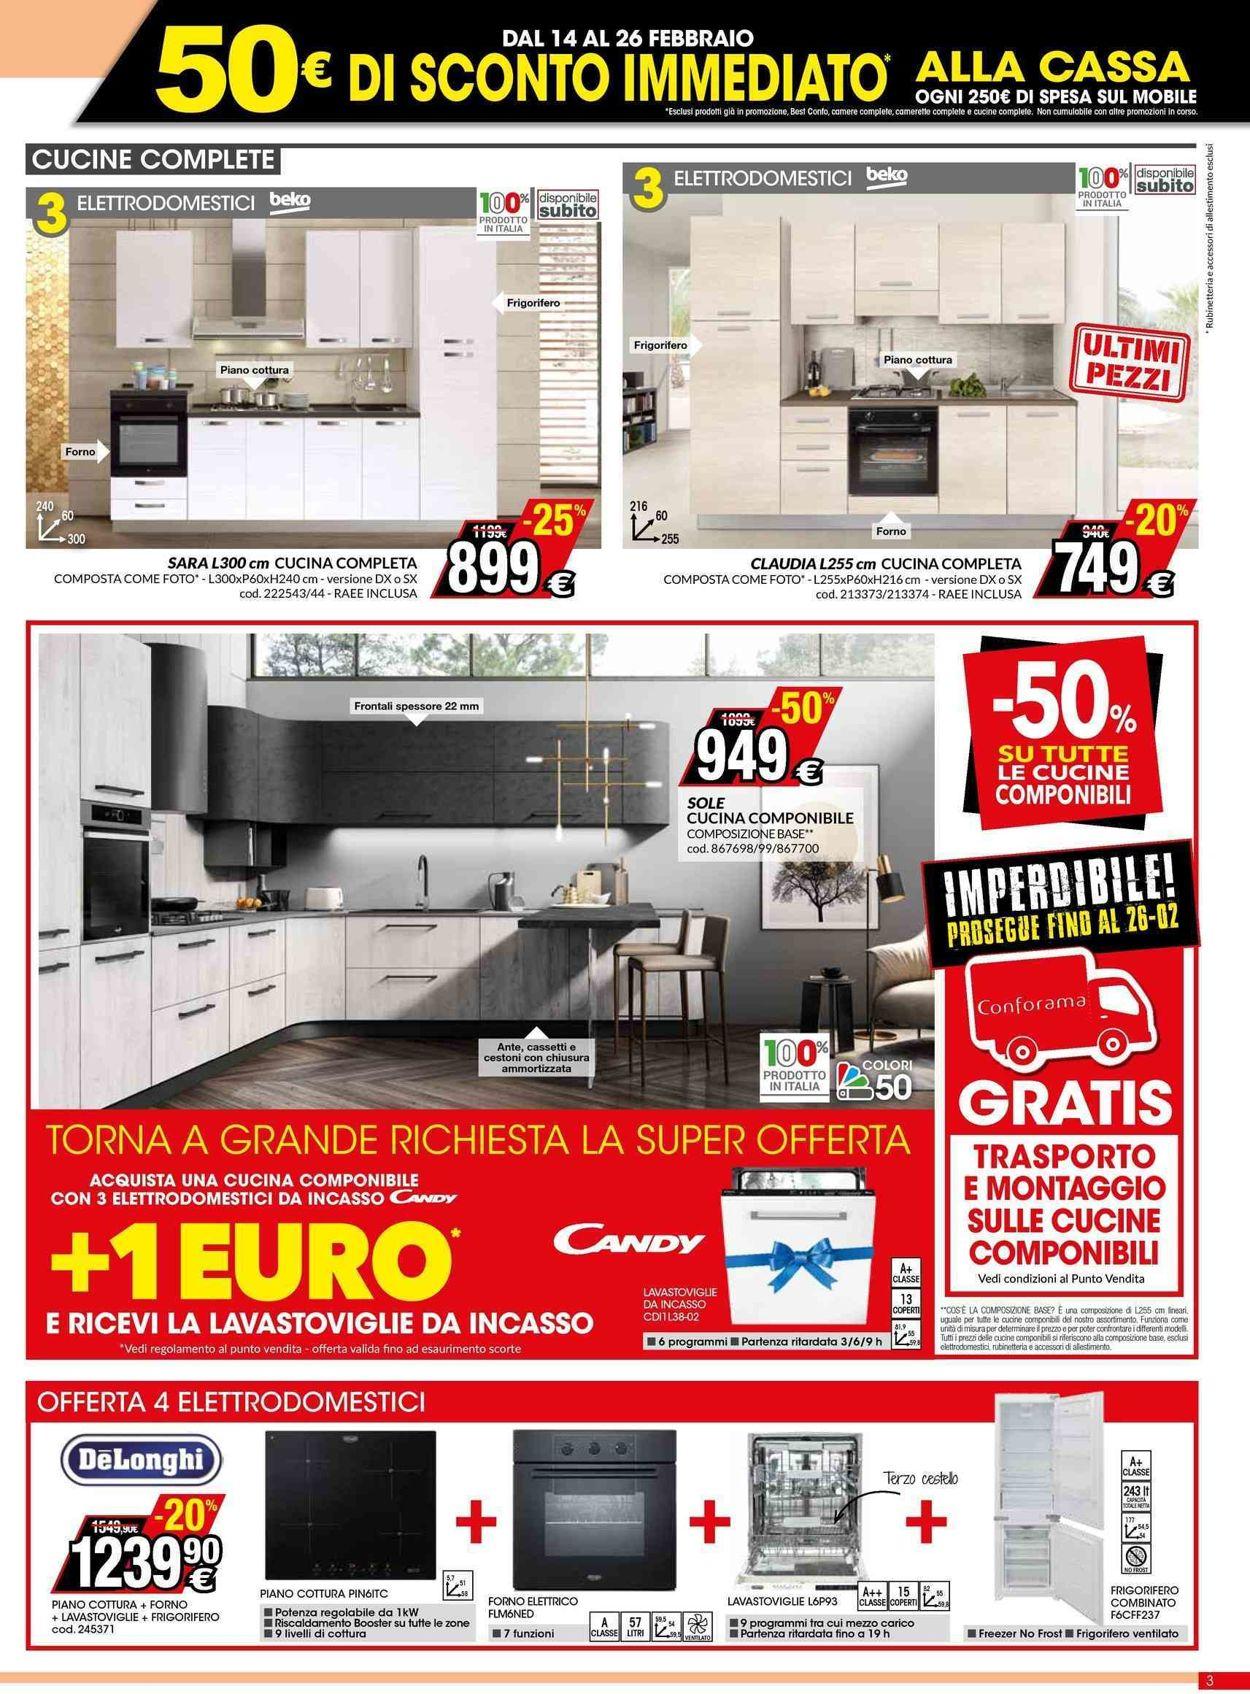 Volantino Conforama - Offerte 14/02-26/02/2020 (Pagina 3)